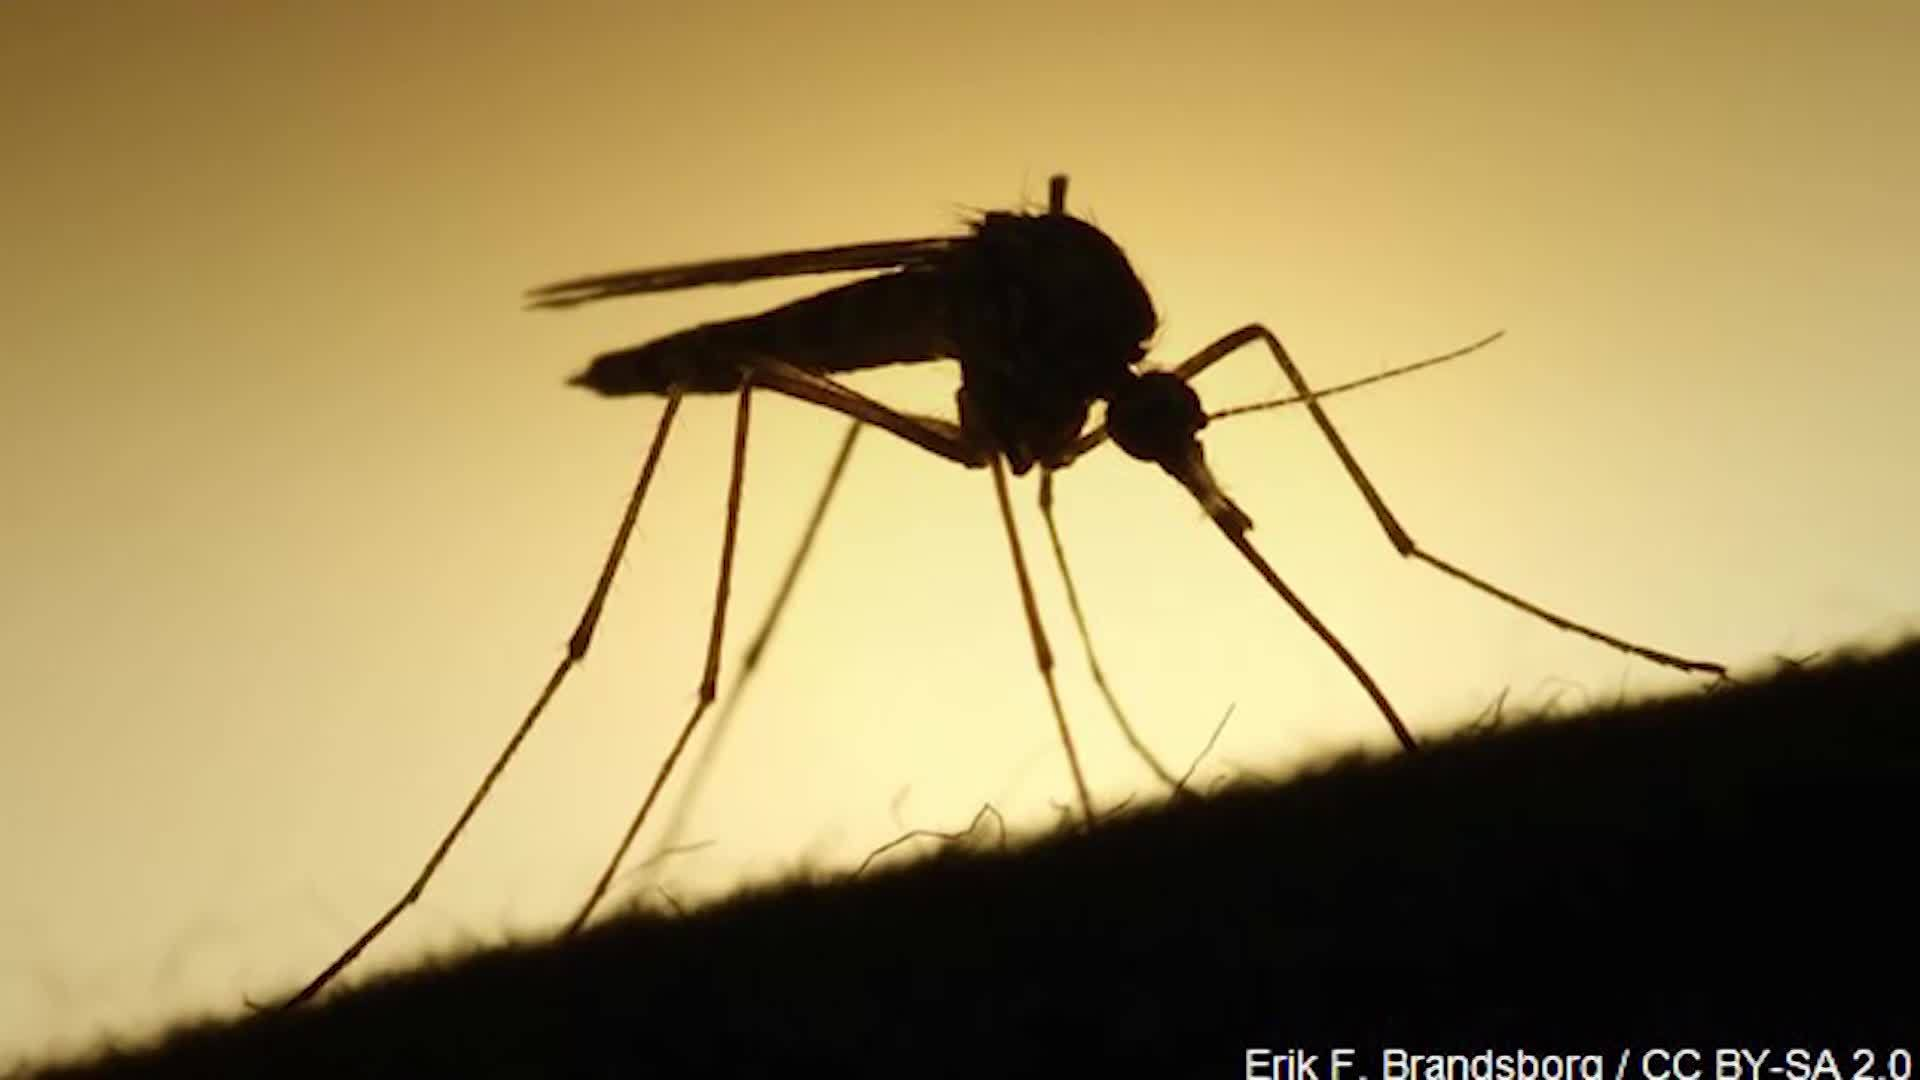 'Mega mosquitoes' up to 20 times larger than normal invading Carolinas